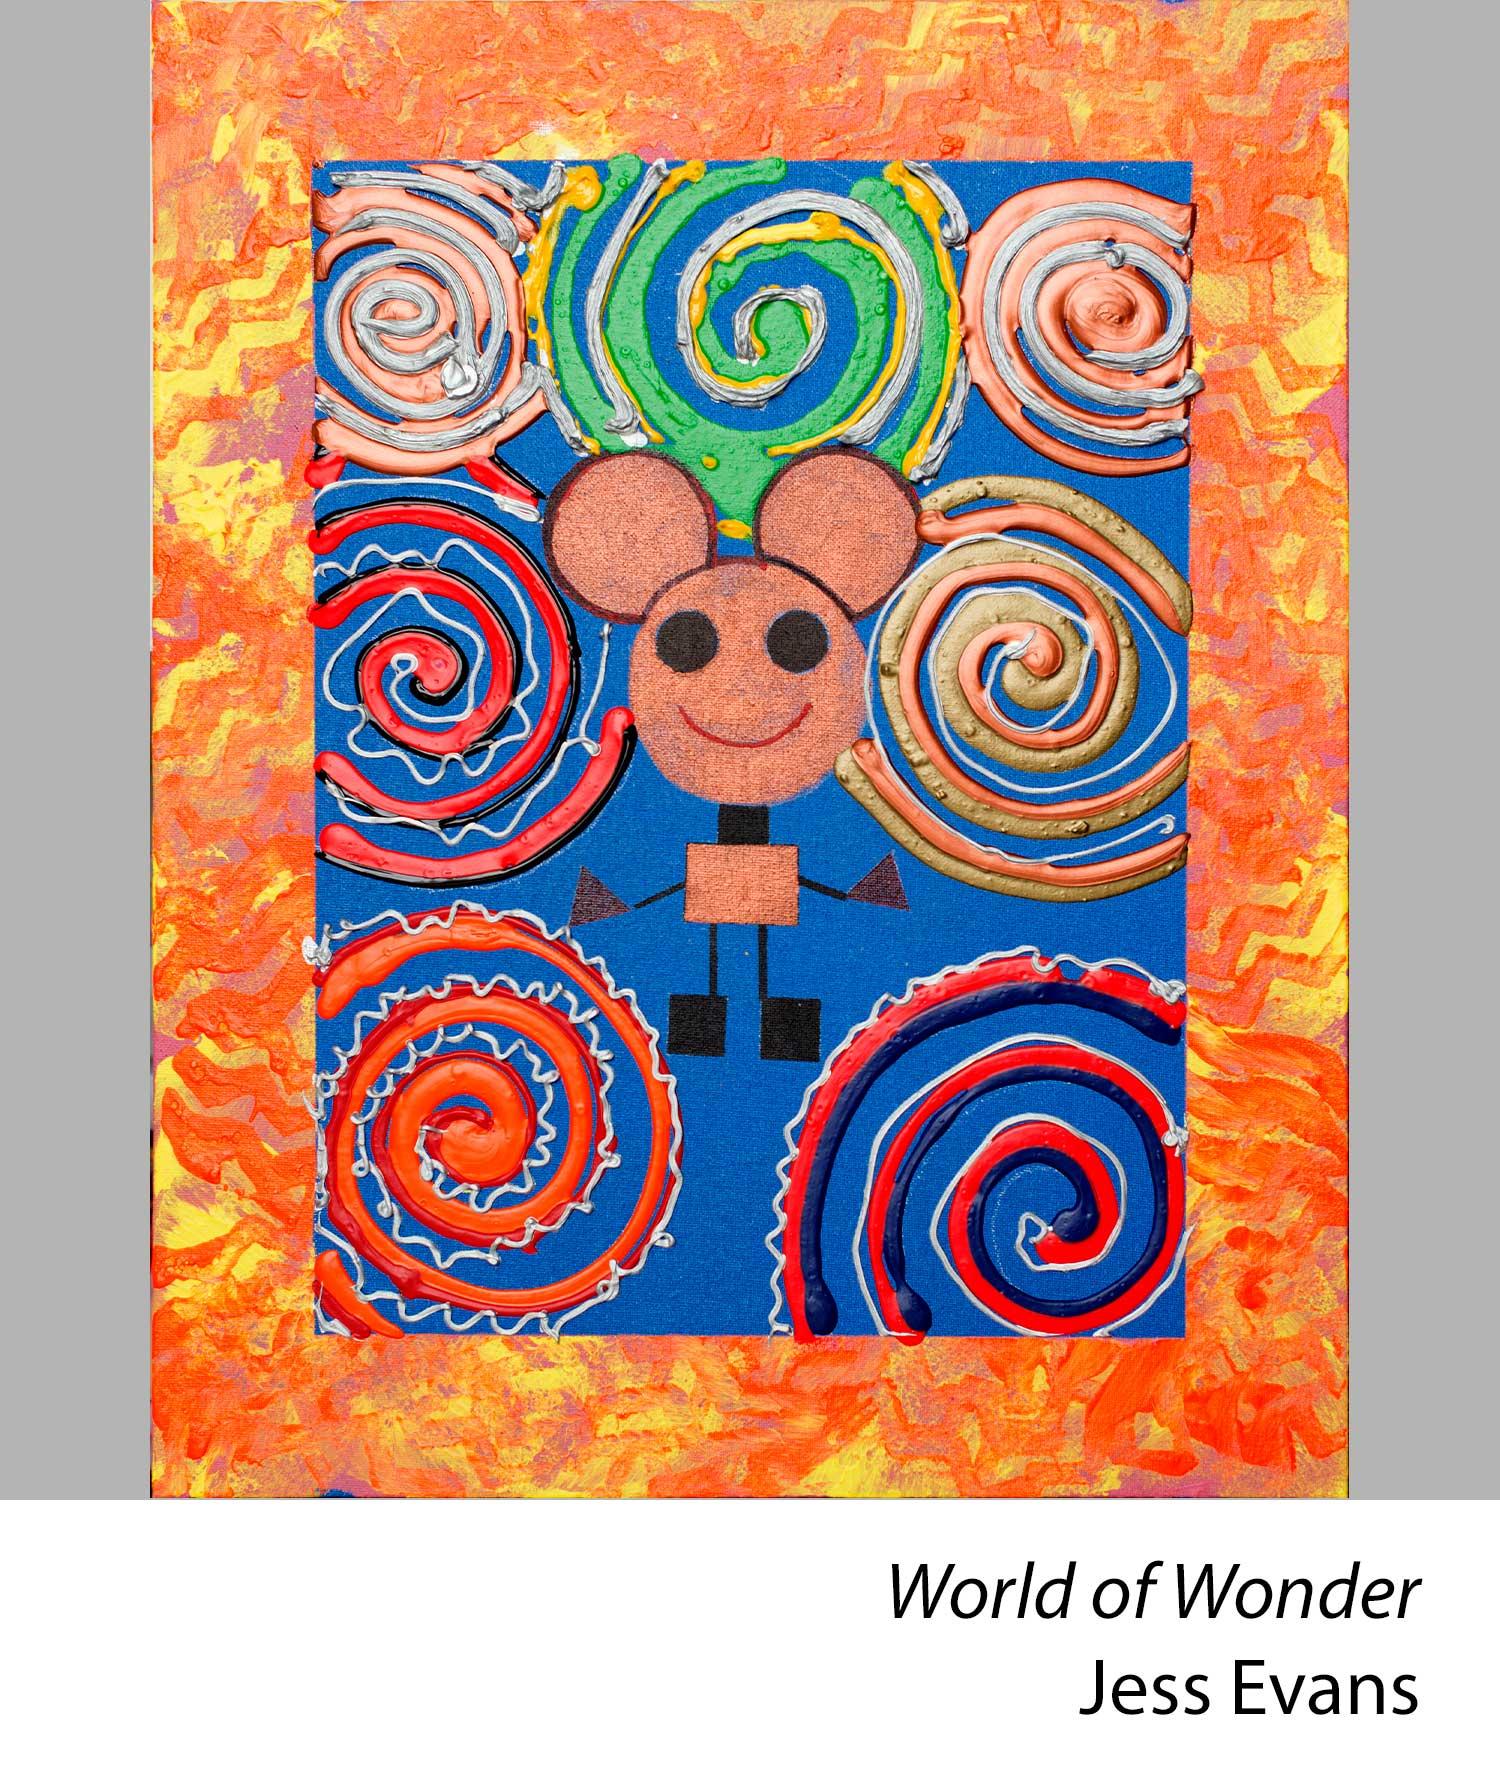 World of Wonder by Jess Evans